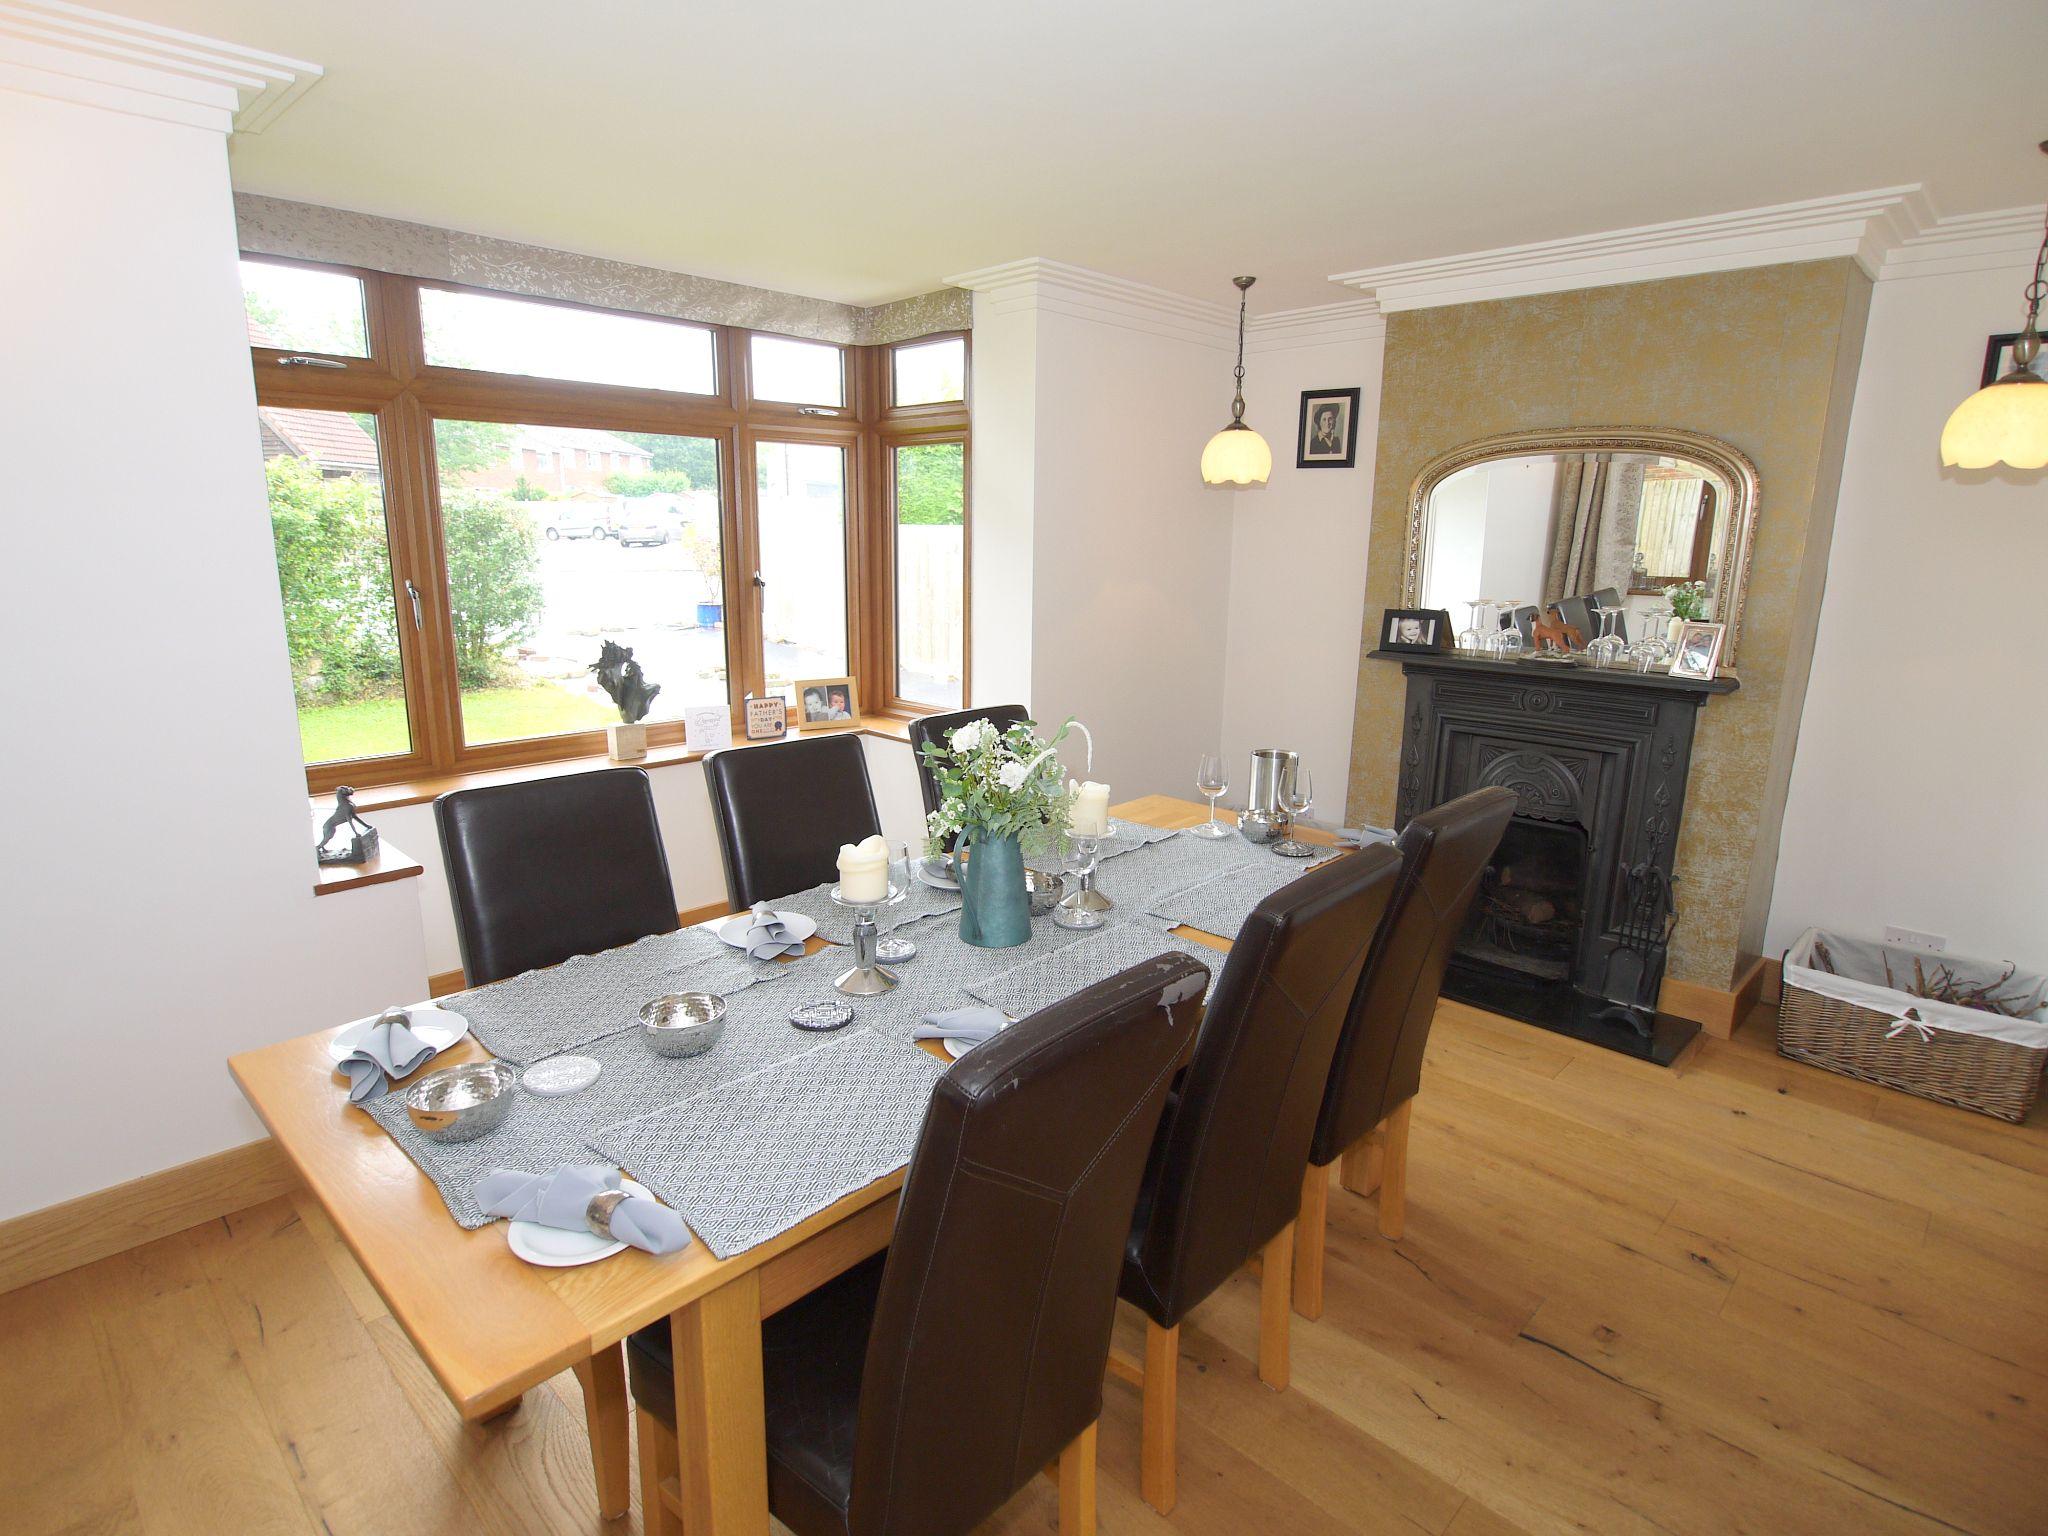 5 bedroom detached house Sold in Sevenoaks - Photograph 6